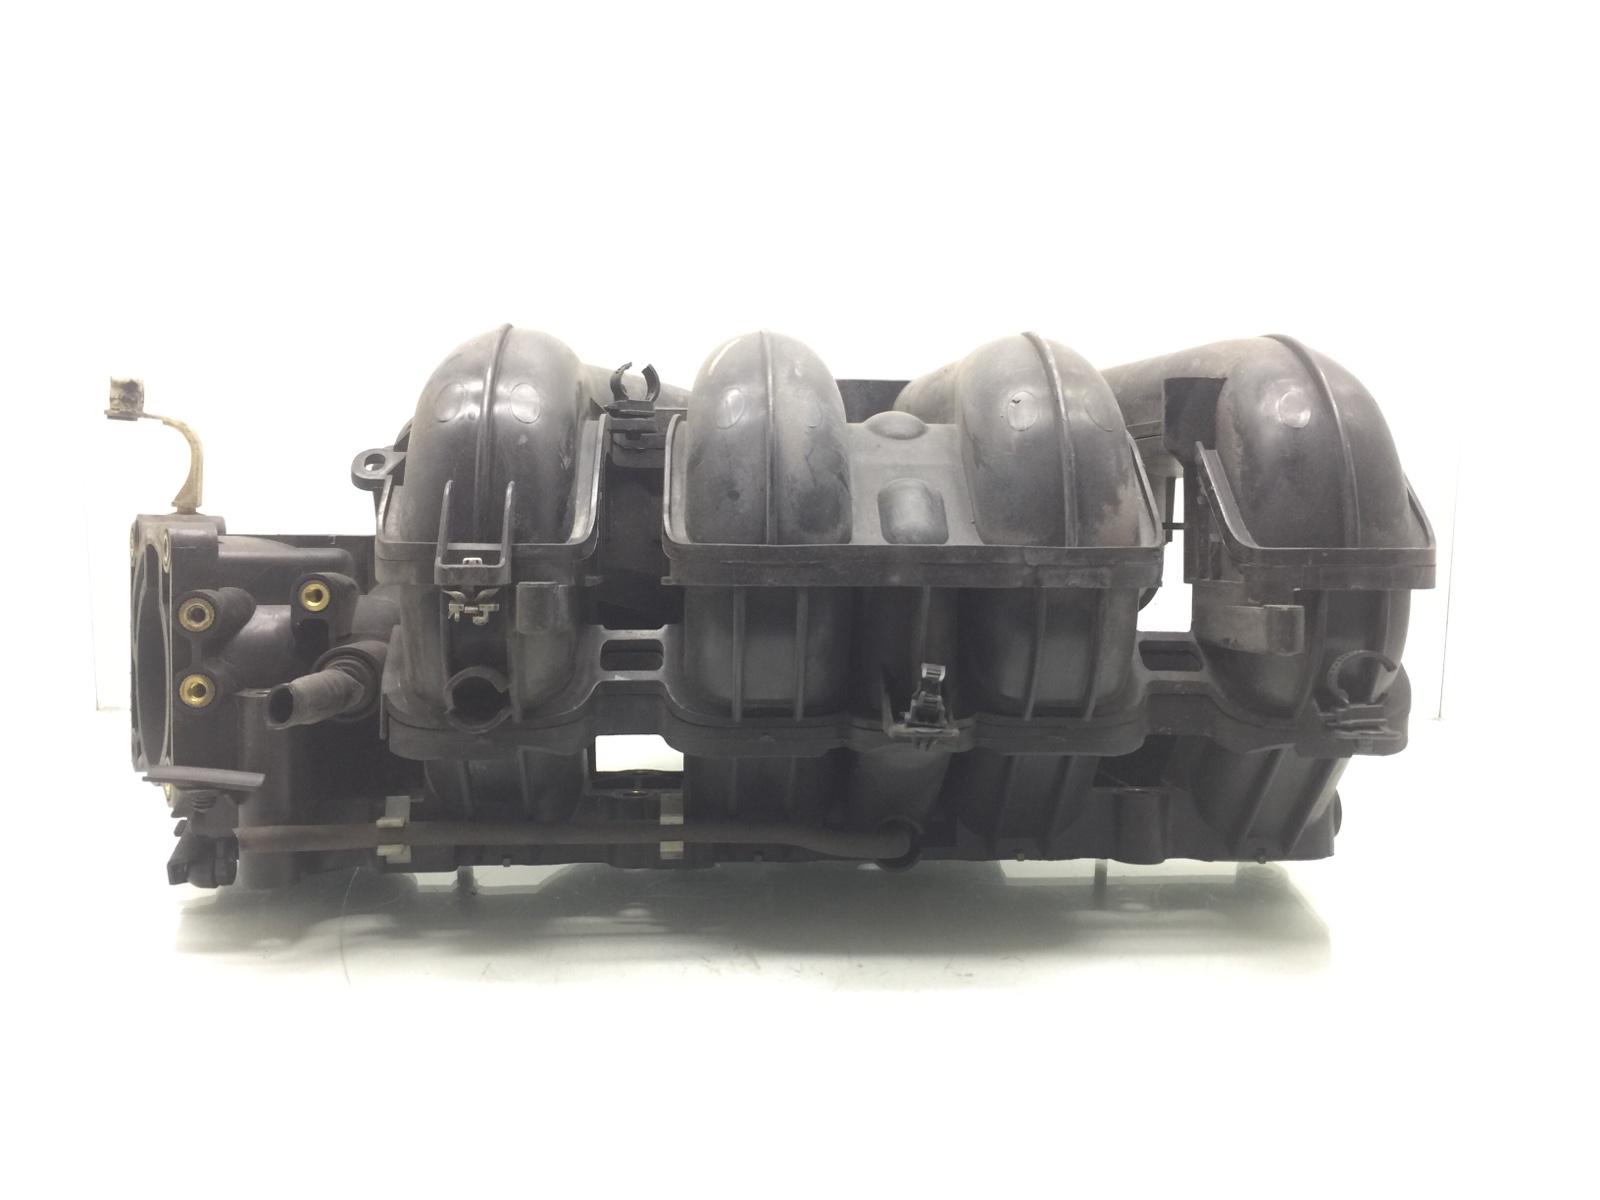 Коллектор впускной Mazda 3 BK 2.0 I 2005 (б/у)